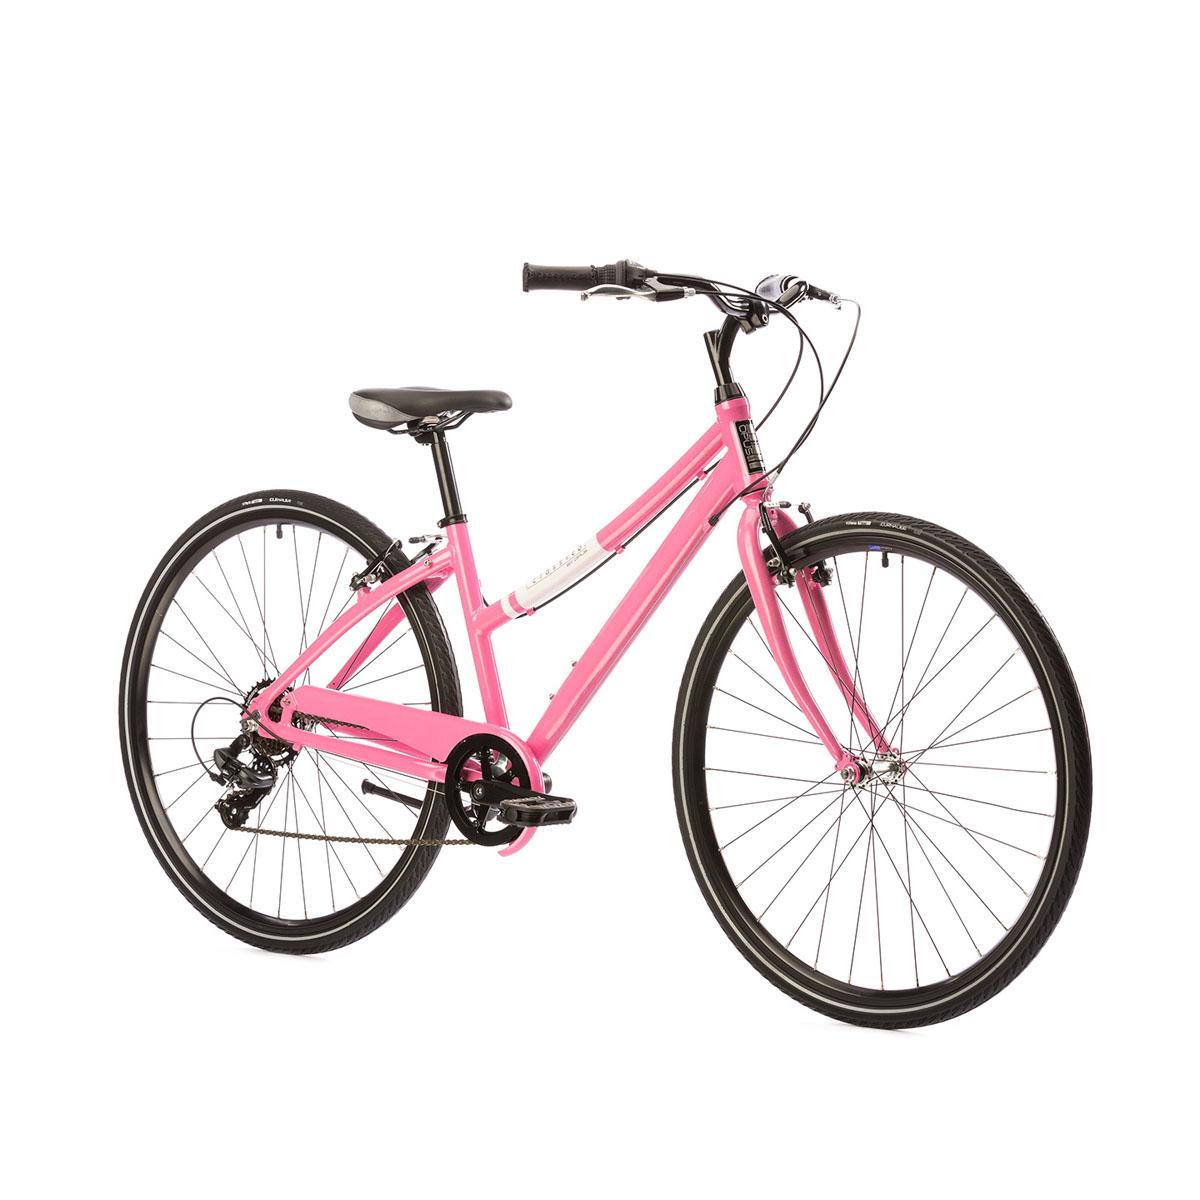 Opus Bike Women's Classico 2 Urban Bicycle